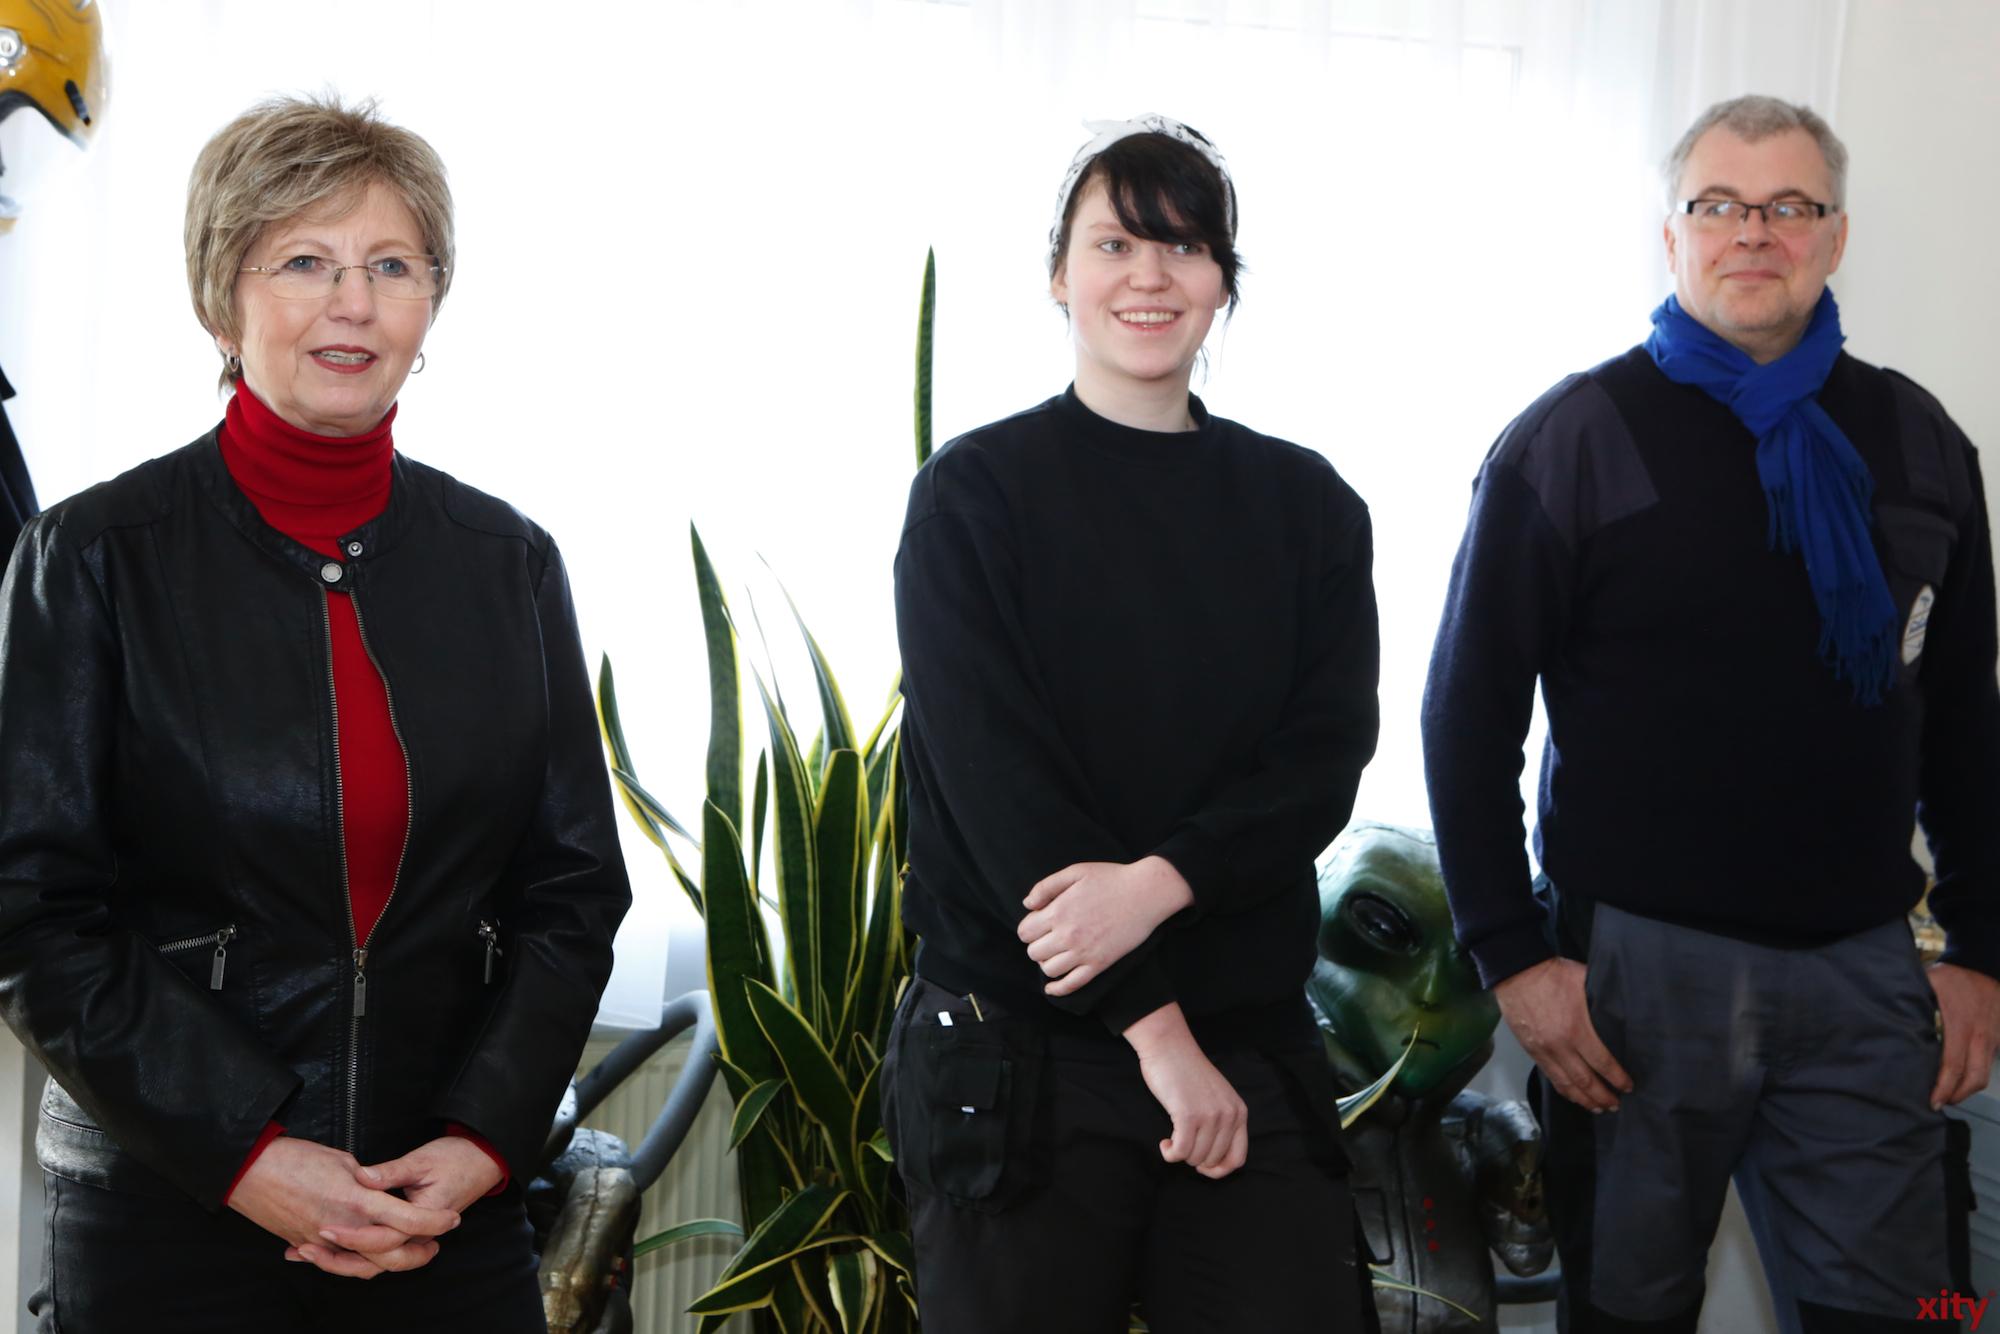 (v.l.) Sigrid Köhler, Dunja Stolarski und Christian Vorderwülbecke (Foto: xity)